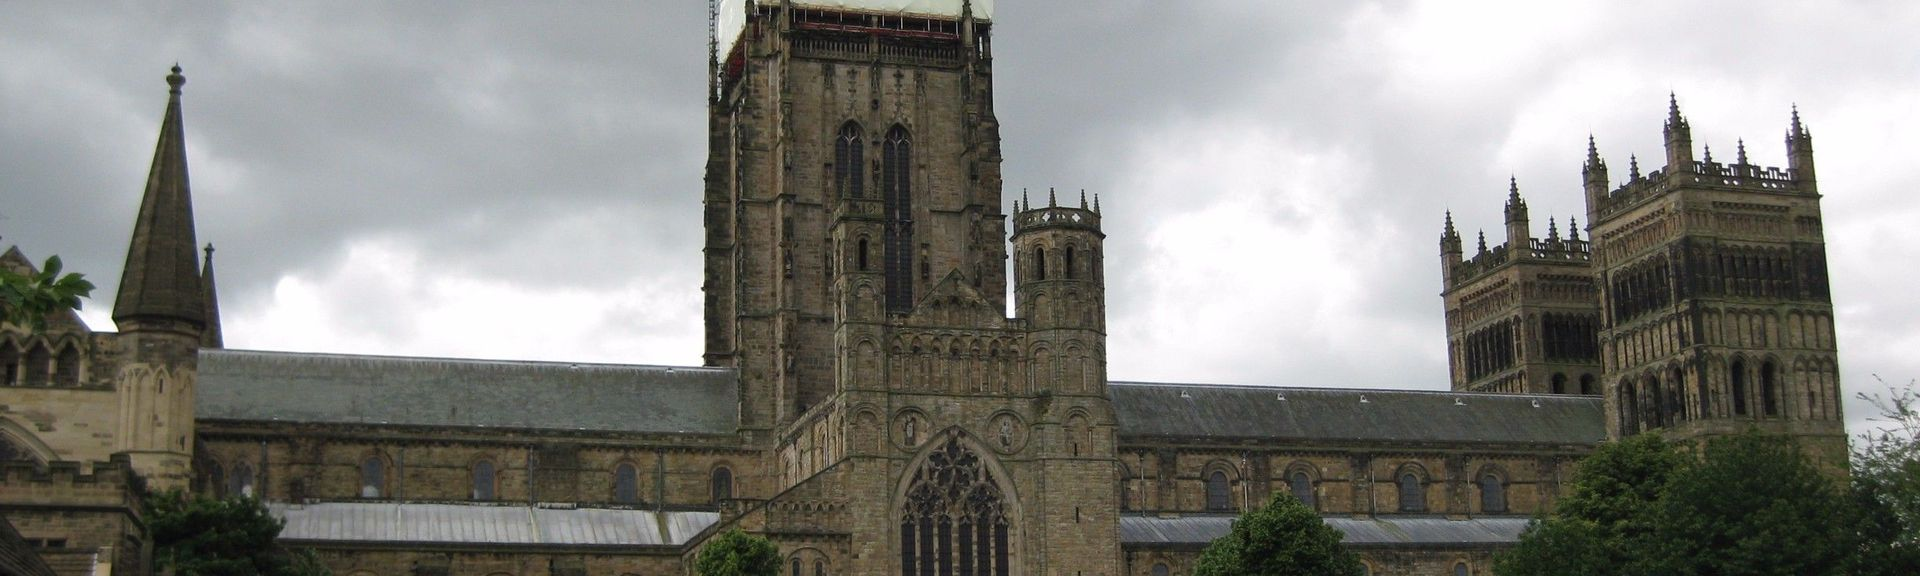 Durham, County Durham, UK